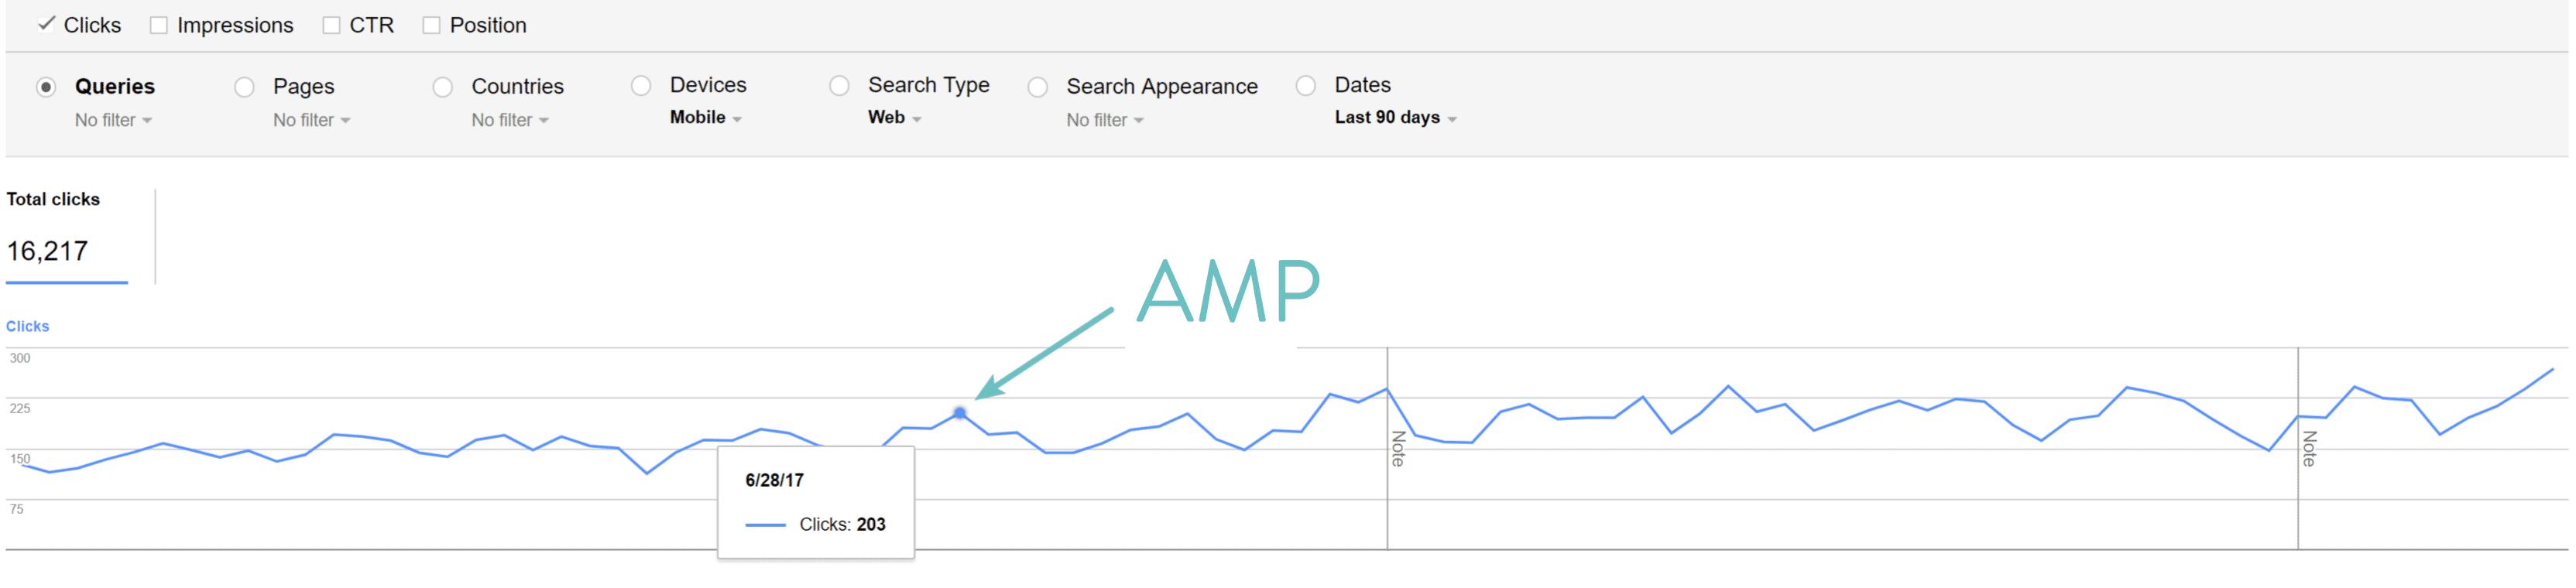 Google AMP-klick